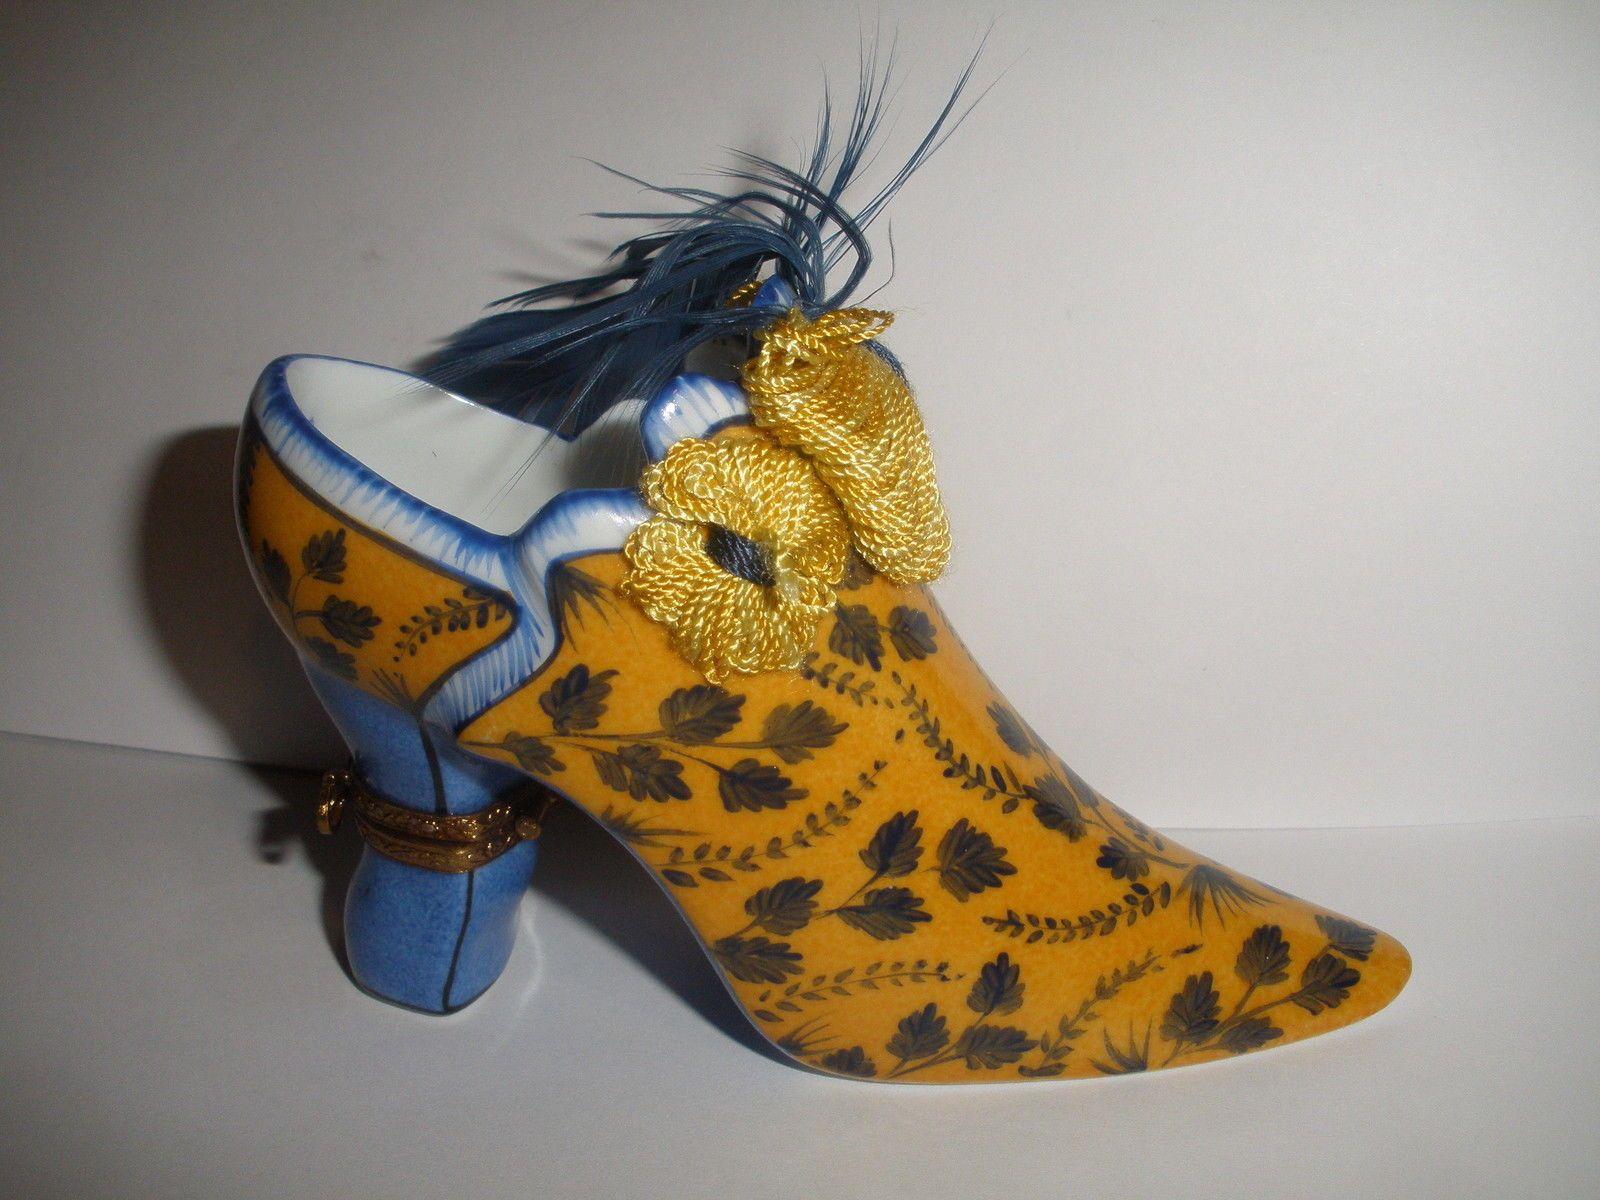 Limoges Box Fiona Saunders Floral Victorian Shoe 2 Trinket Box 185